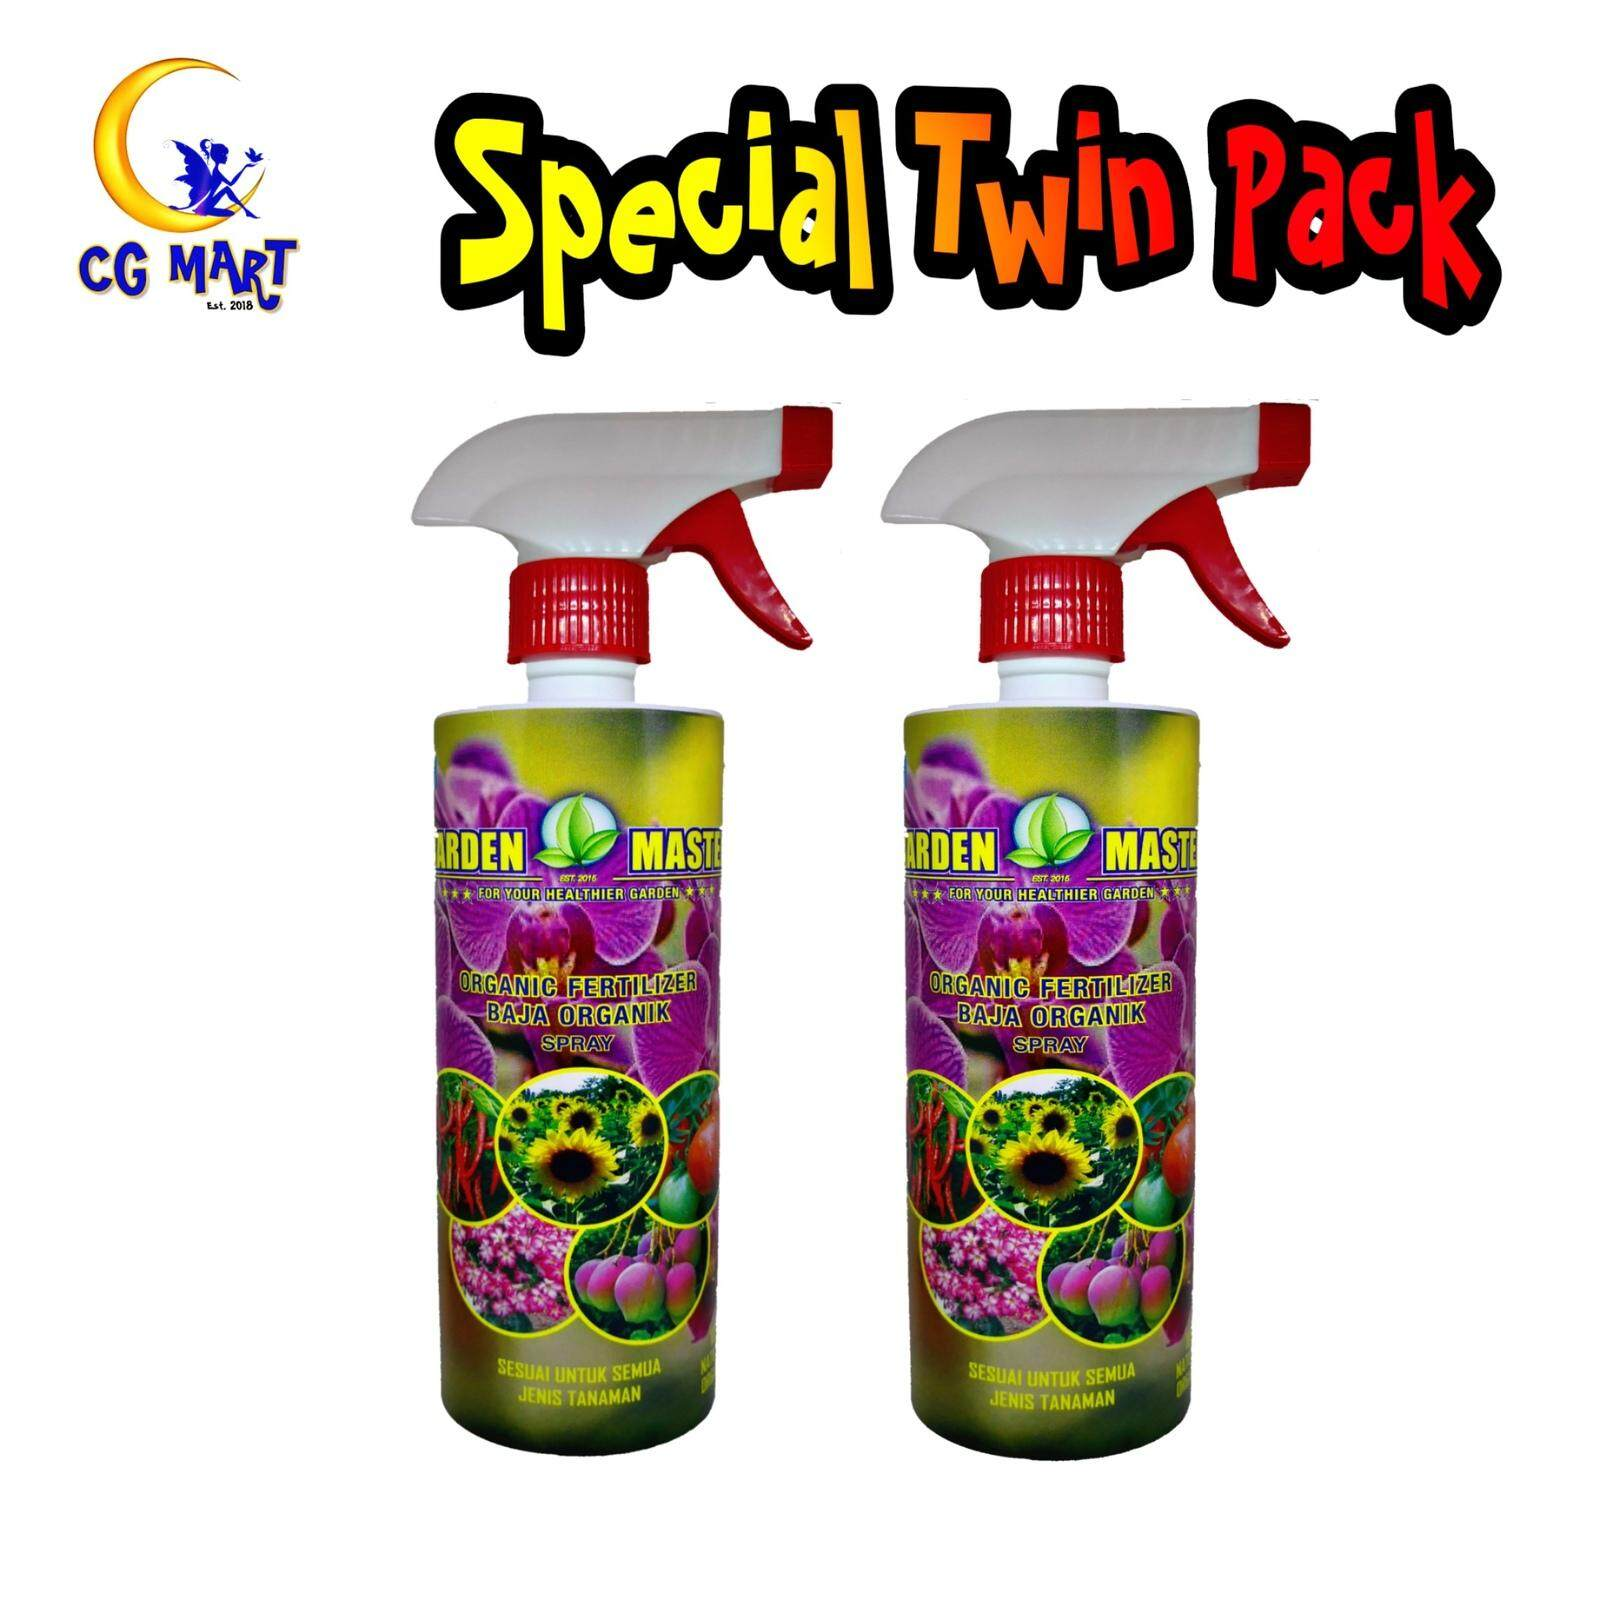 [Twin Pack] Orchid & Rose Organic Fertilizer Spray - Baja Orkid & Ros Organik Semburan (1000ML)